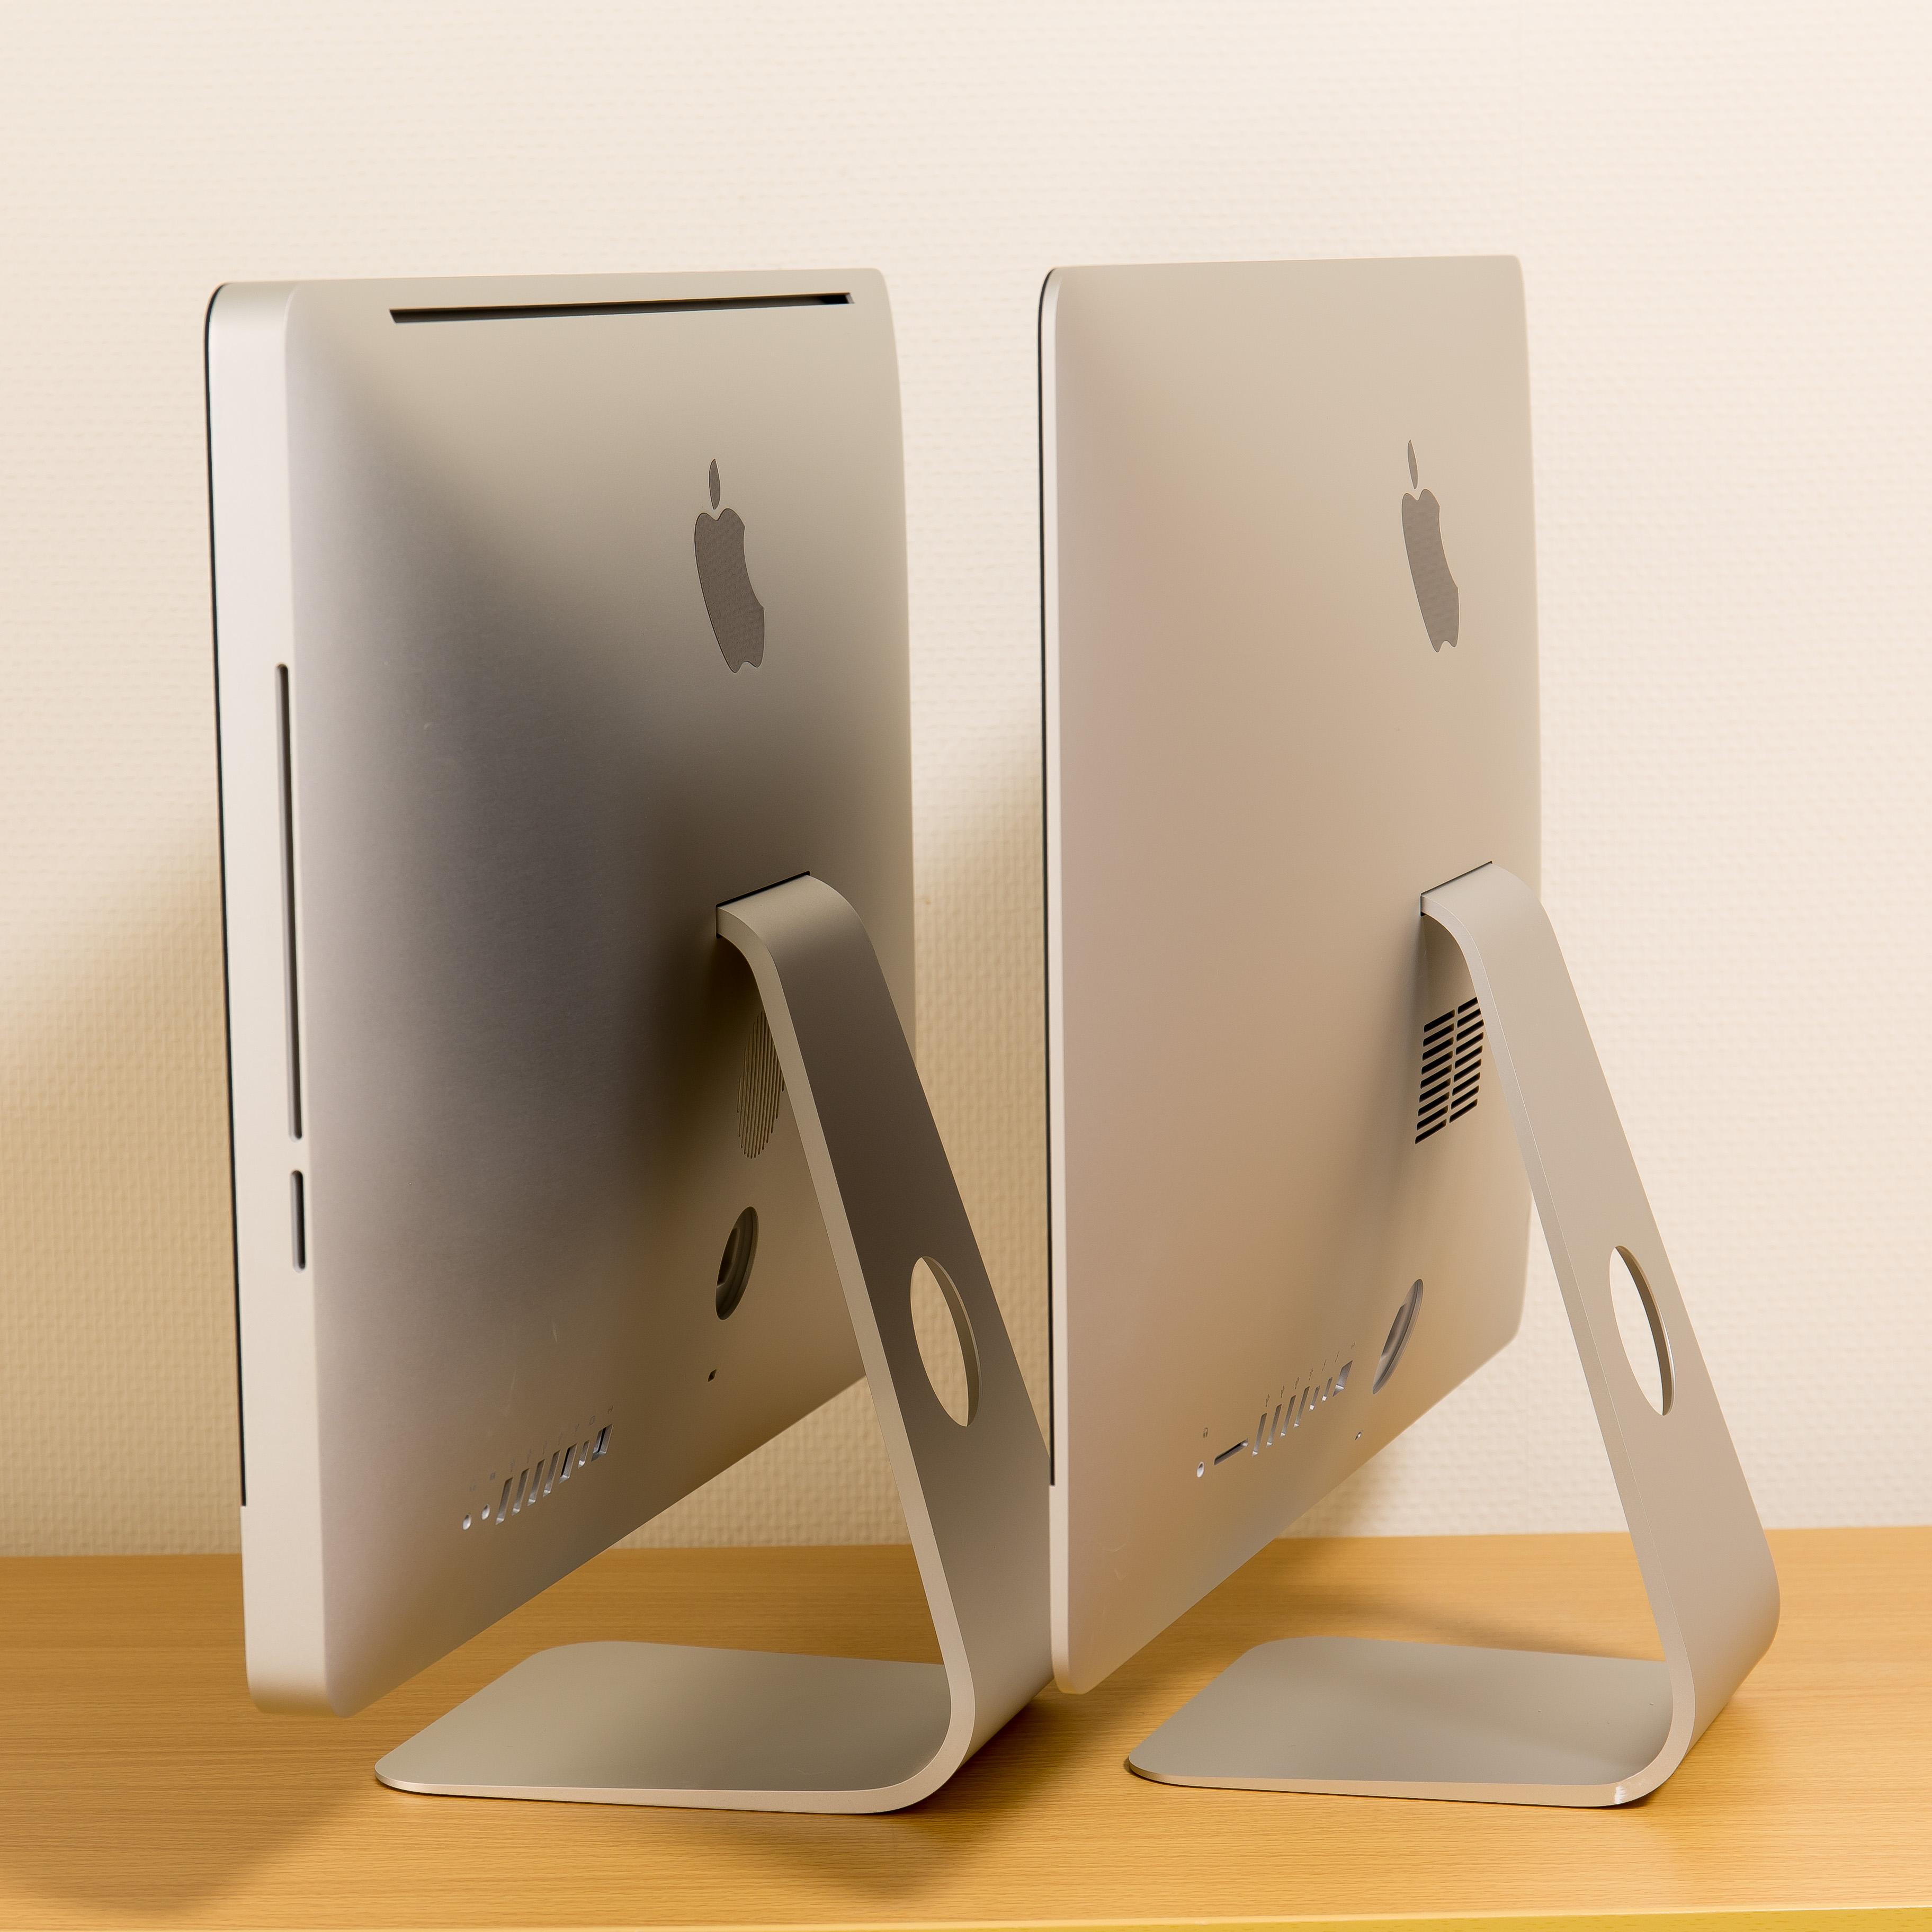 「iMac Retina 21.5インチ」購入(4)